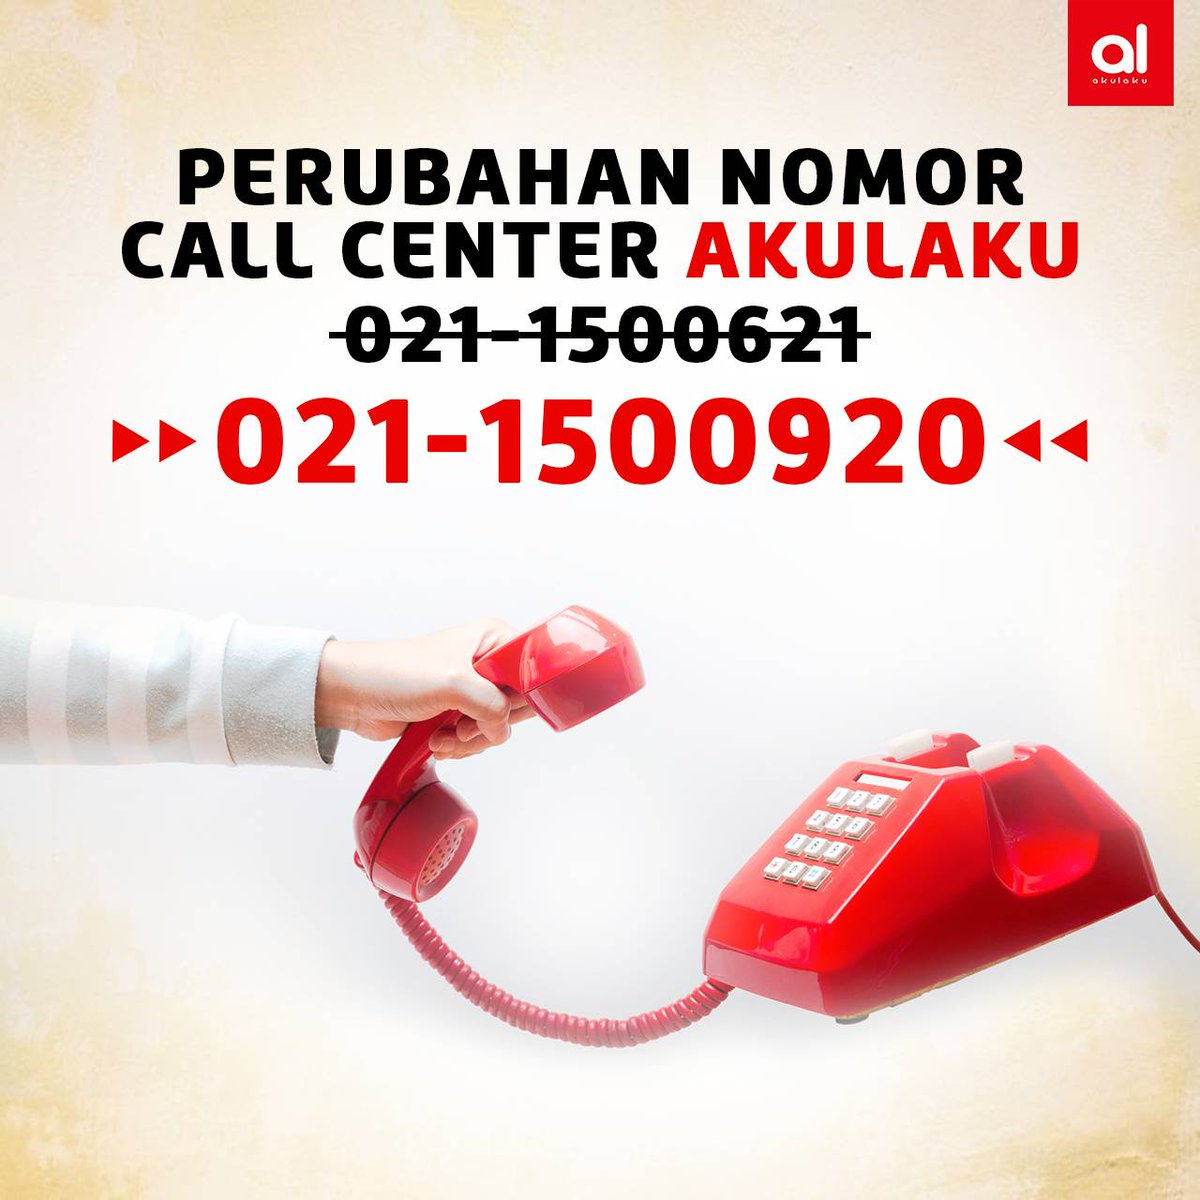 Akulaku Indonesia On Twitter Alovers Nomor Call Center Akulaku Akan Berubah Menjadi 1500920 Dengan Layanan Operasional Senin Minggu Pukul 08 00 21 00 Mohon Untuk Tidak Menghubungi Nomor Lain Yang Mengatasnamakan Akulaku Selain Nomor Yang Tertera